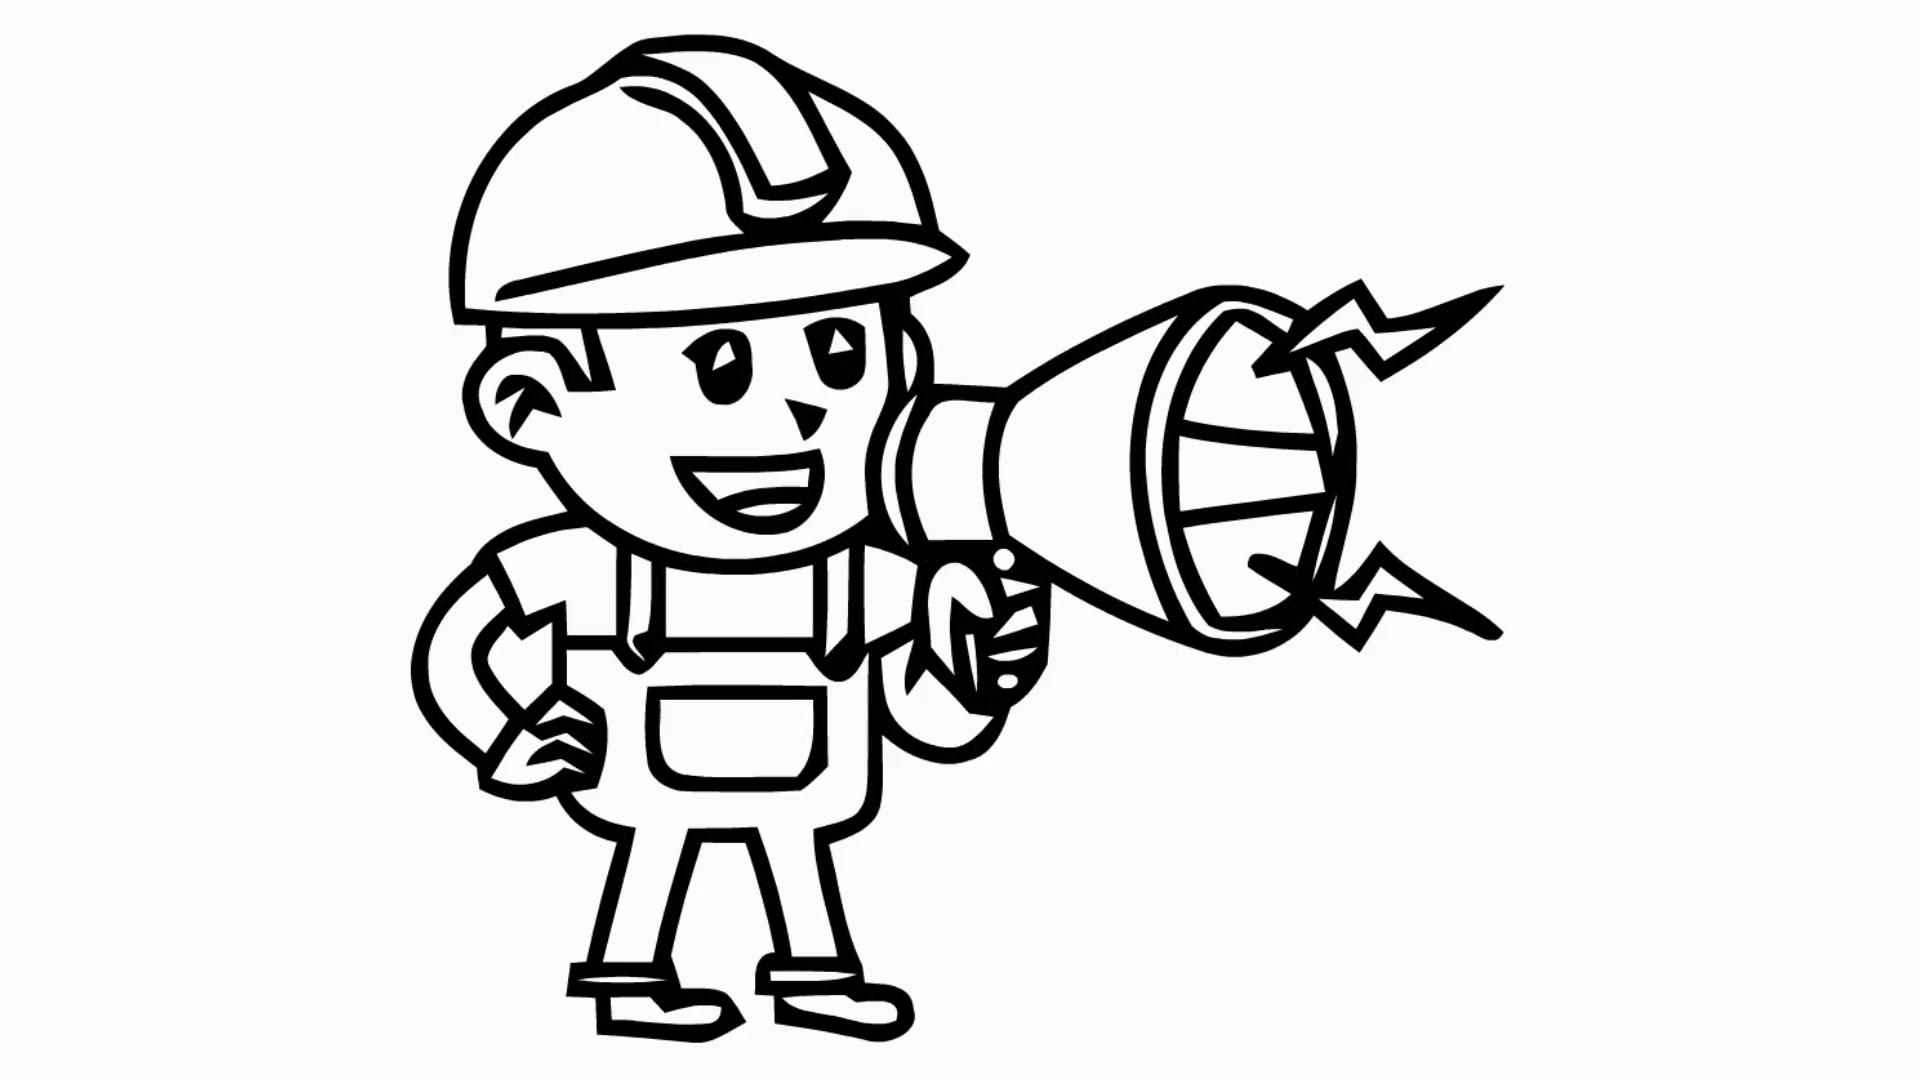 1920x1080 Man With Microphone Cartoon Illustration Hand Drawn Animation